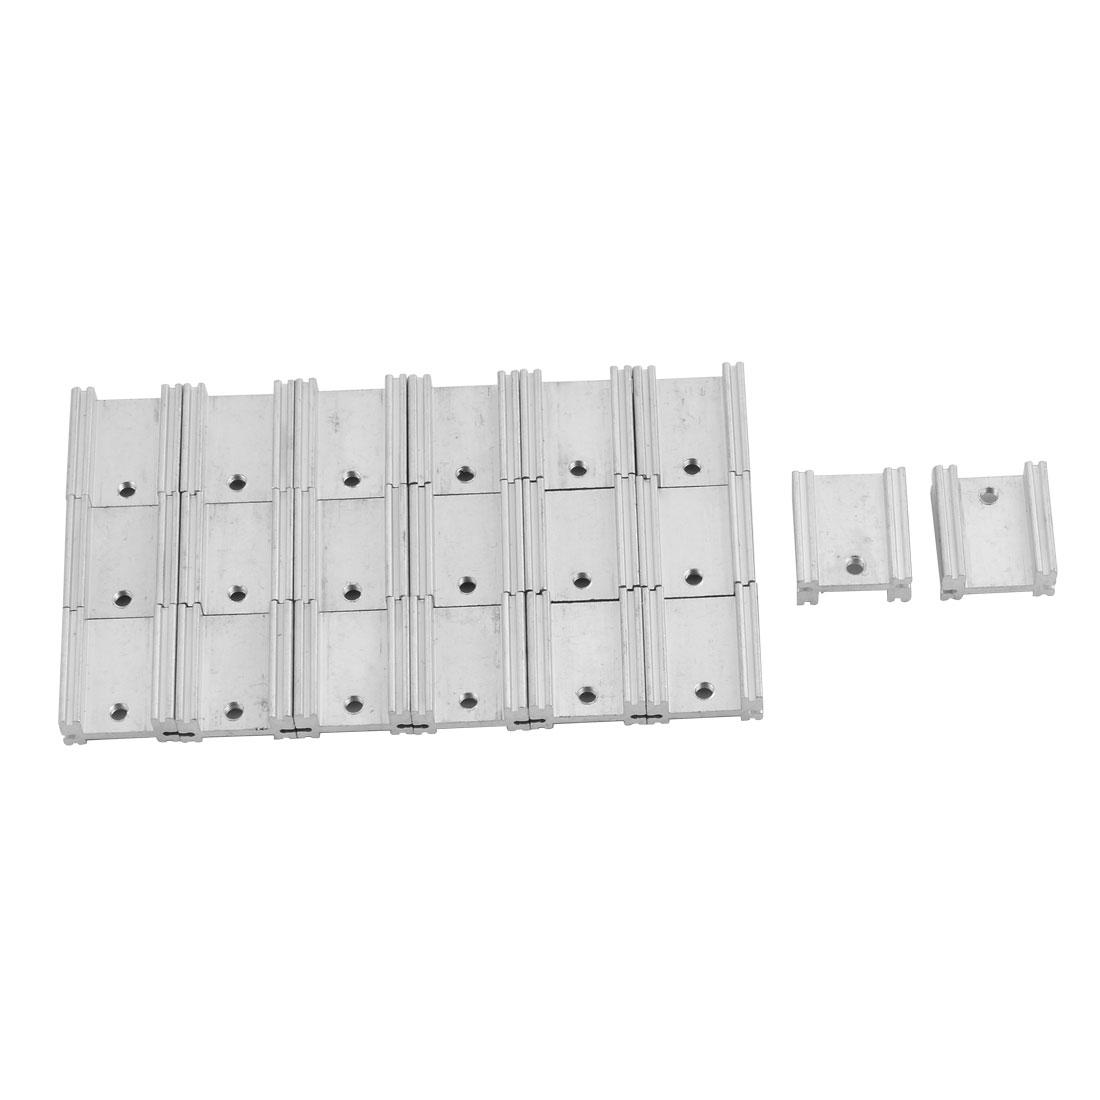 Aluminium Heatsink Cooling Fin Cooler Silver Tone 19mm x 17mm x 8mm 20 Pcs